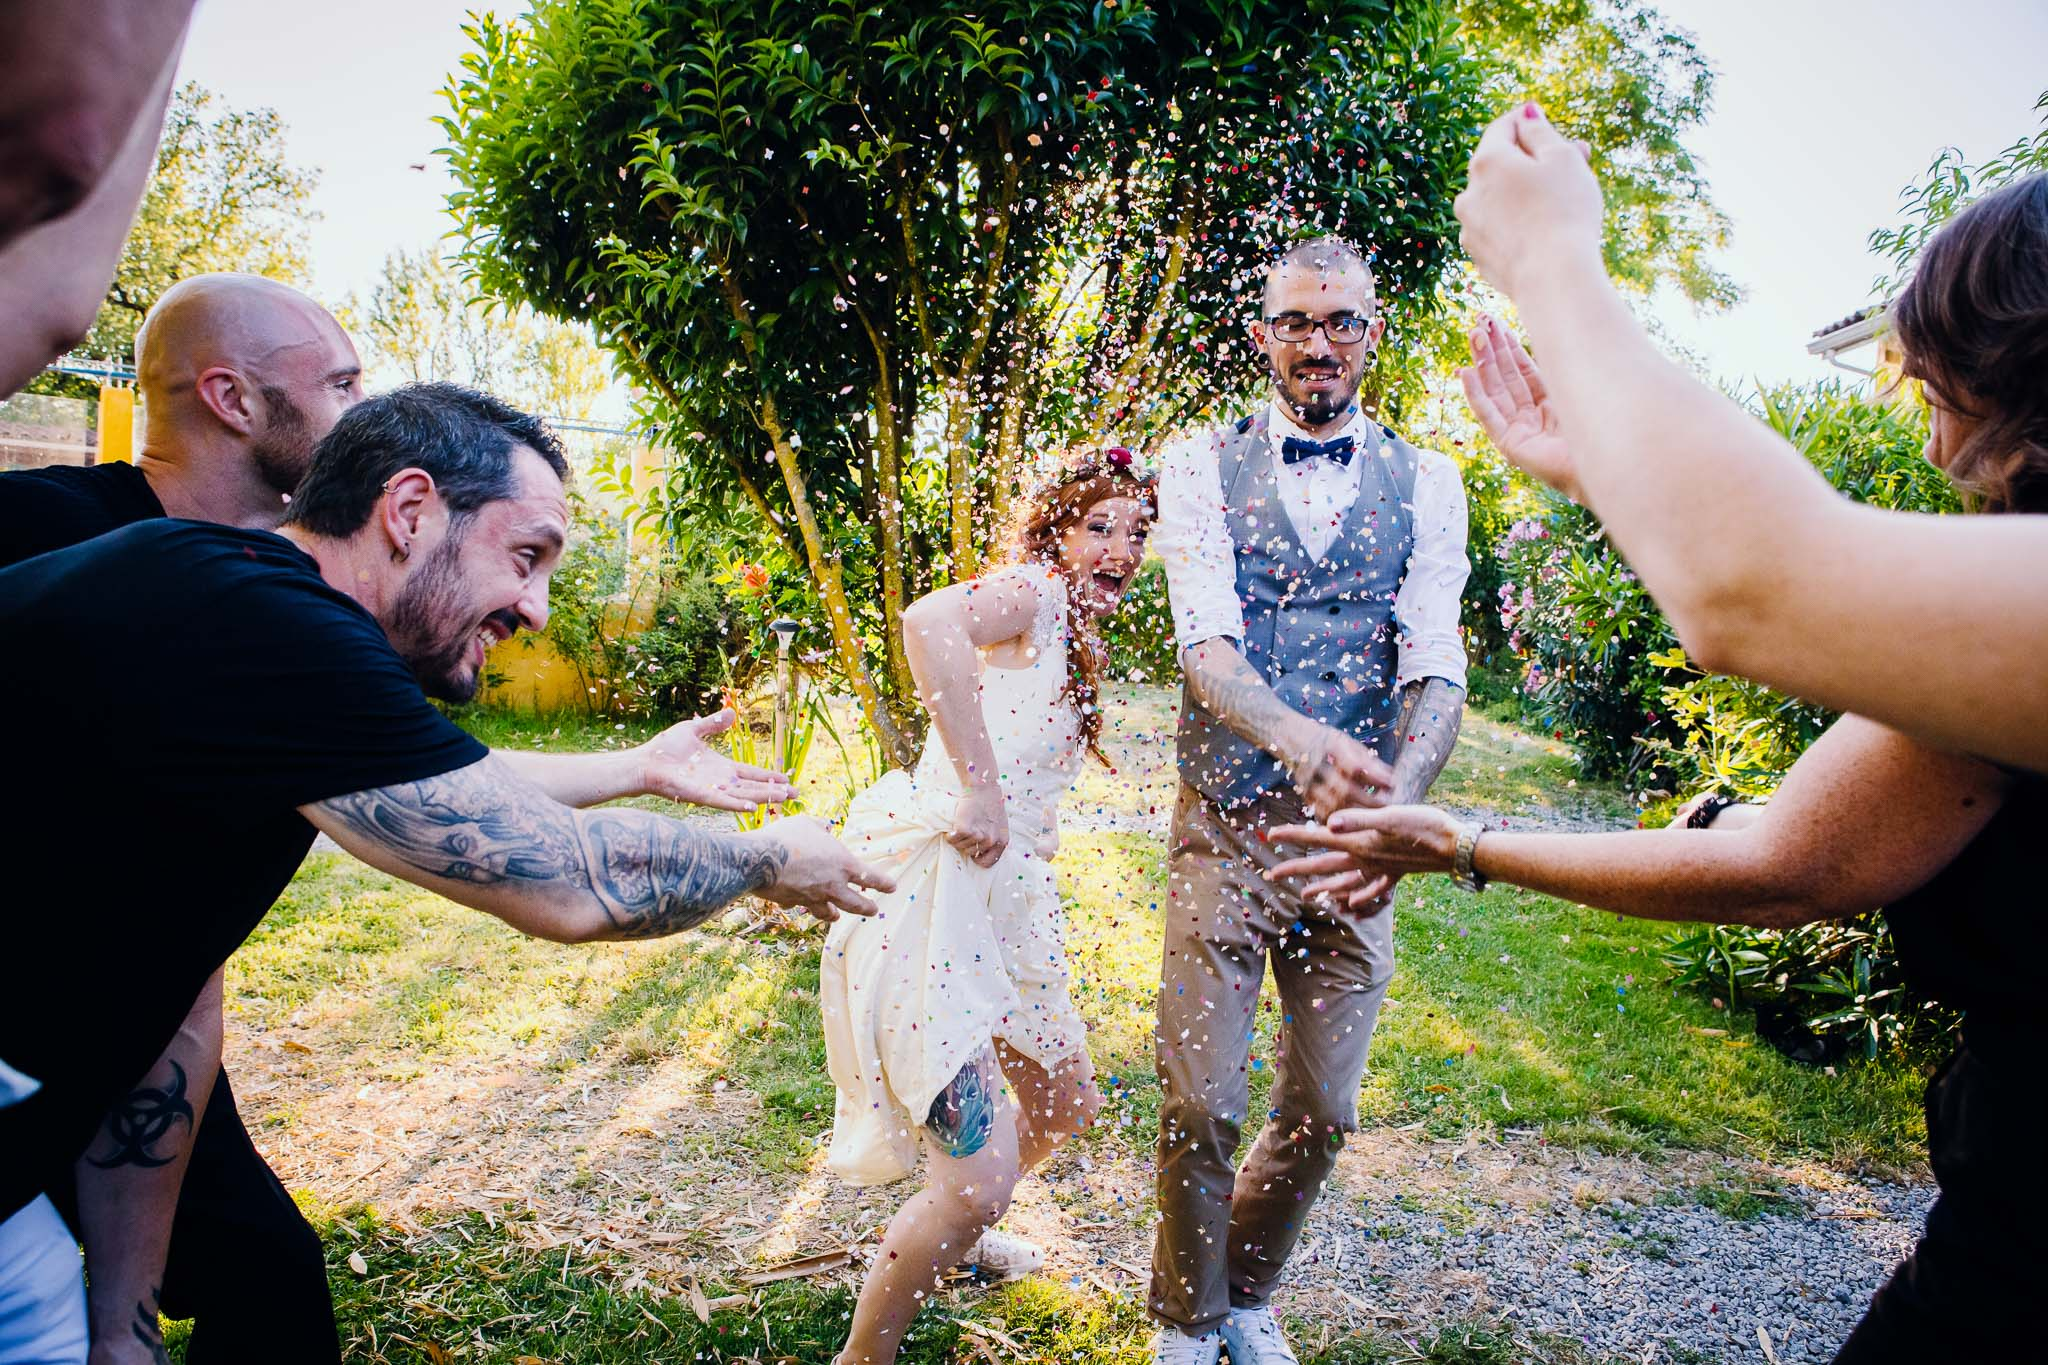 photos de mariage funky floriane caux lifestyle funky wedding photographer. Black Bedroom Furniture Sets. Home Design Ideas